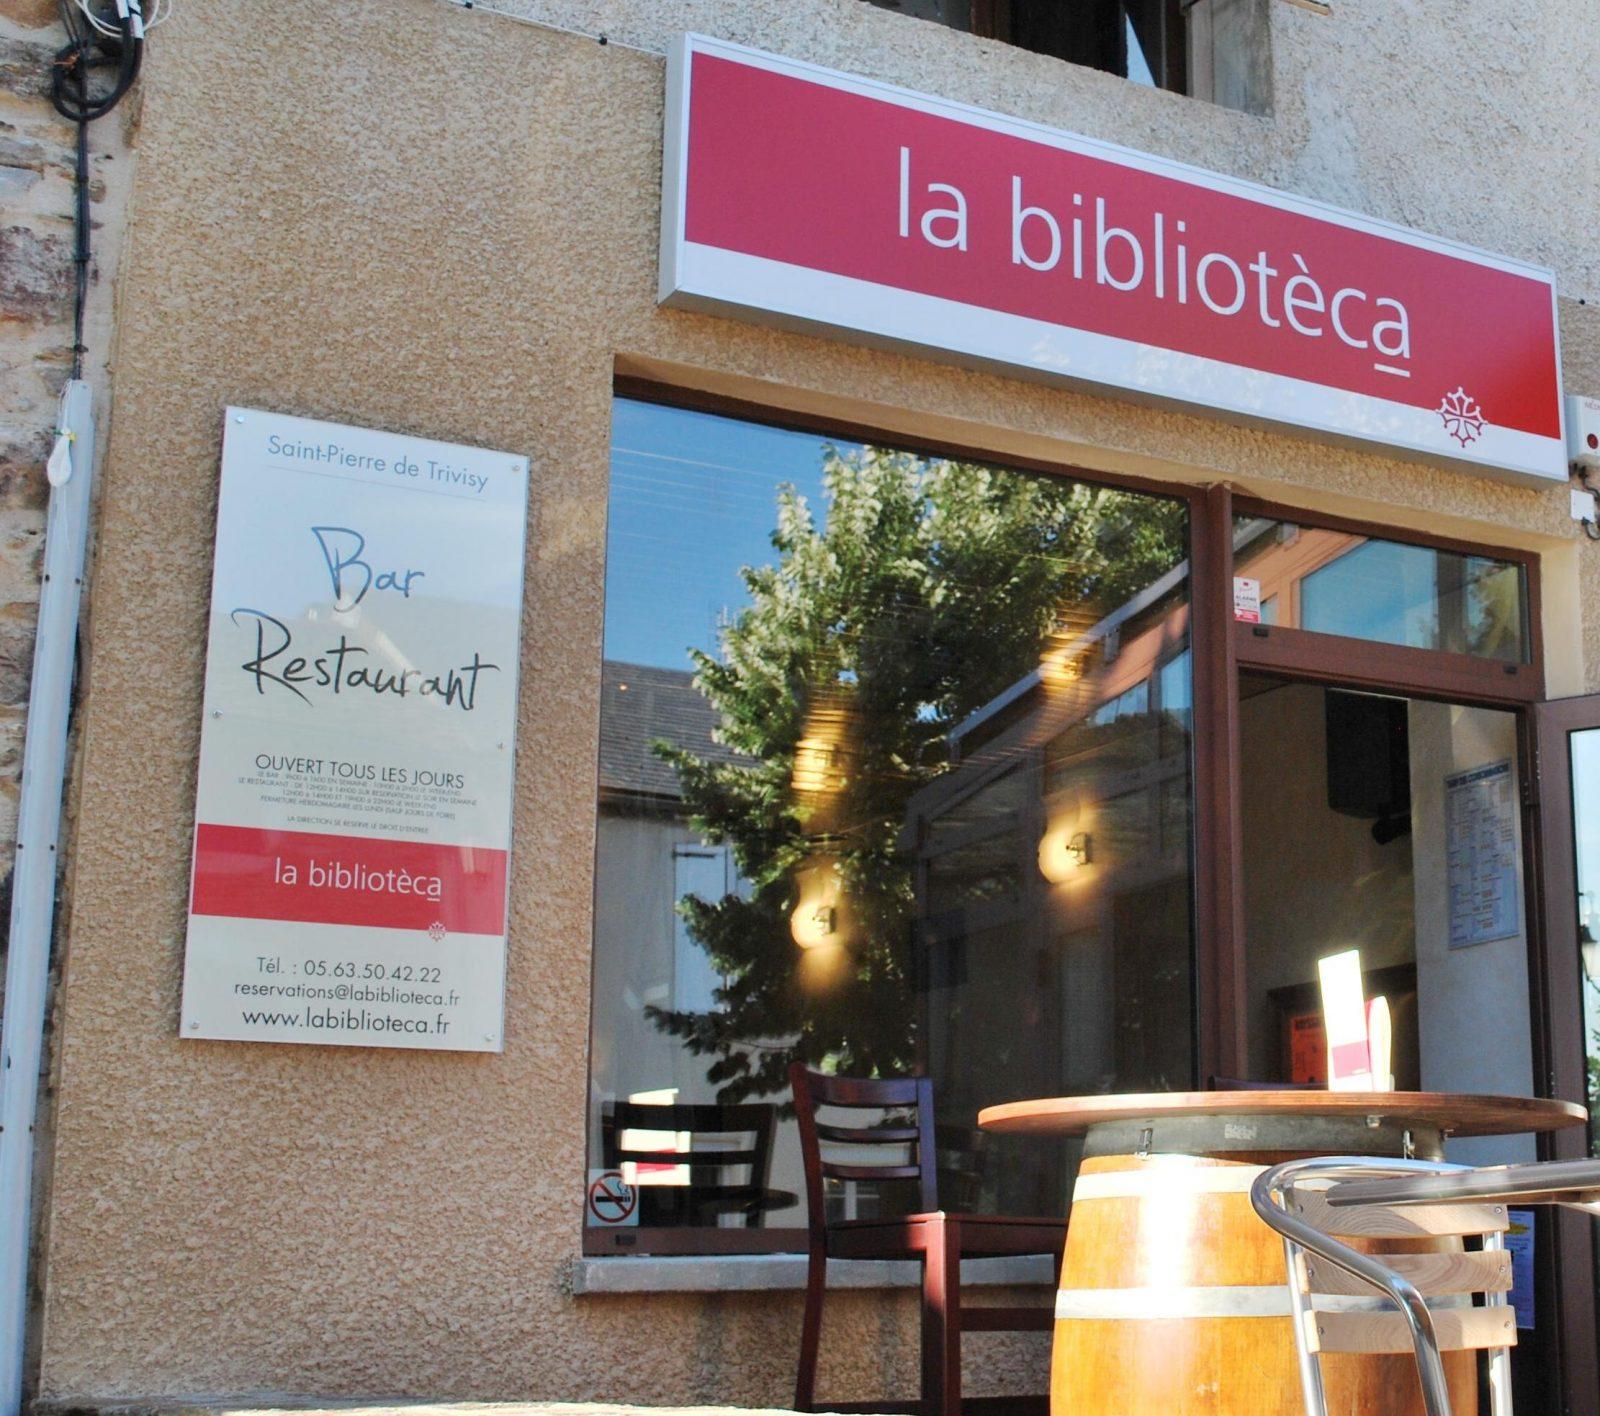 Restaurant La Biblioteca – Saint Pierre de Trivisy